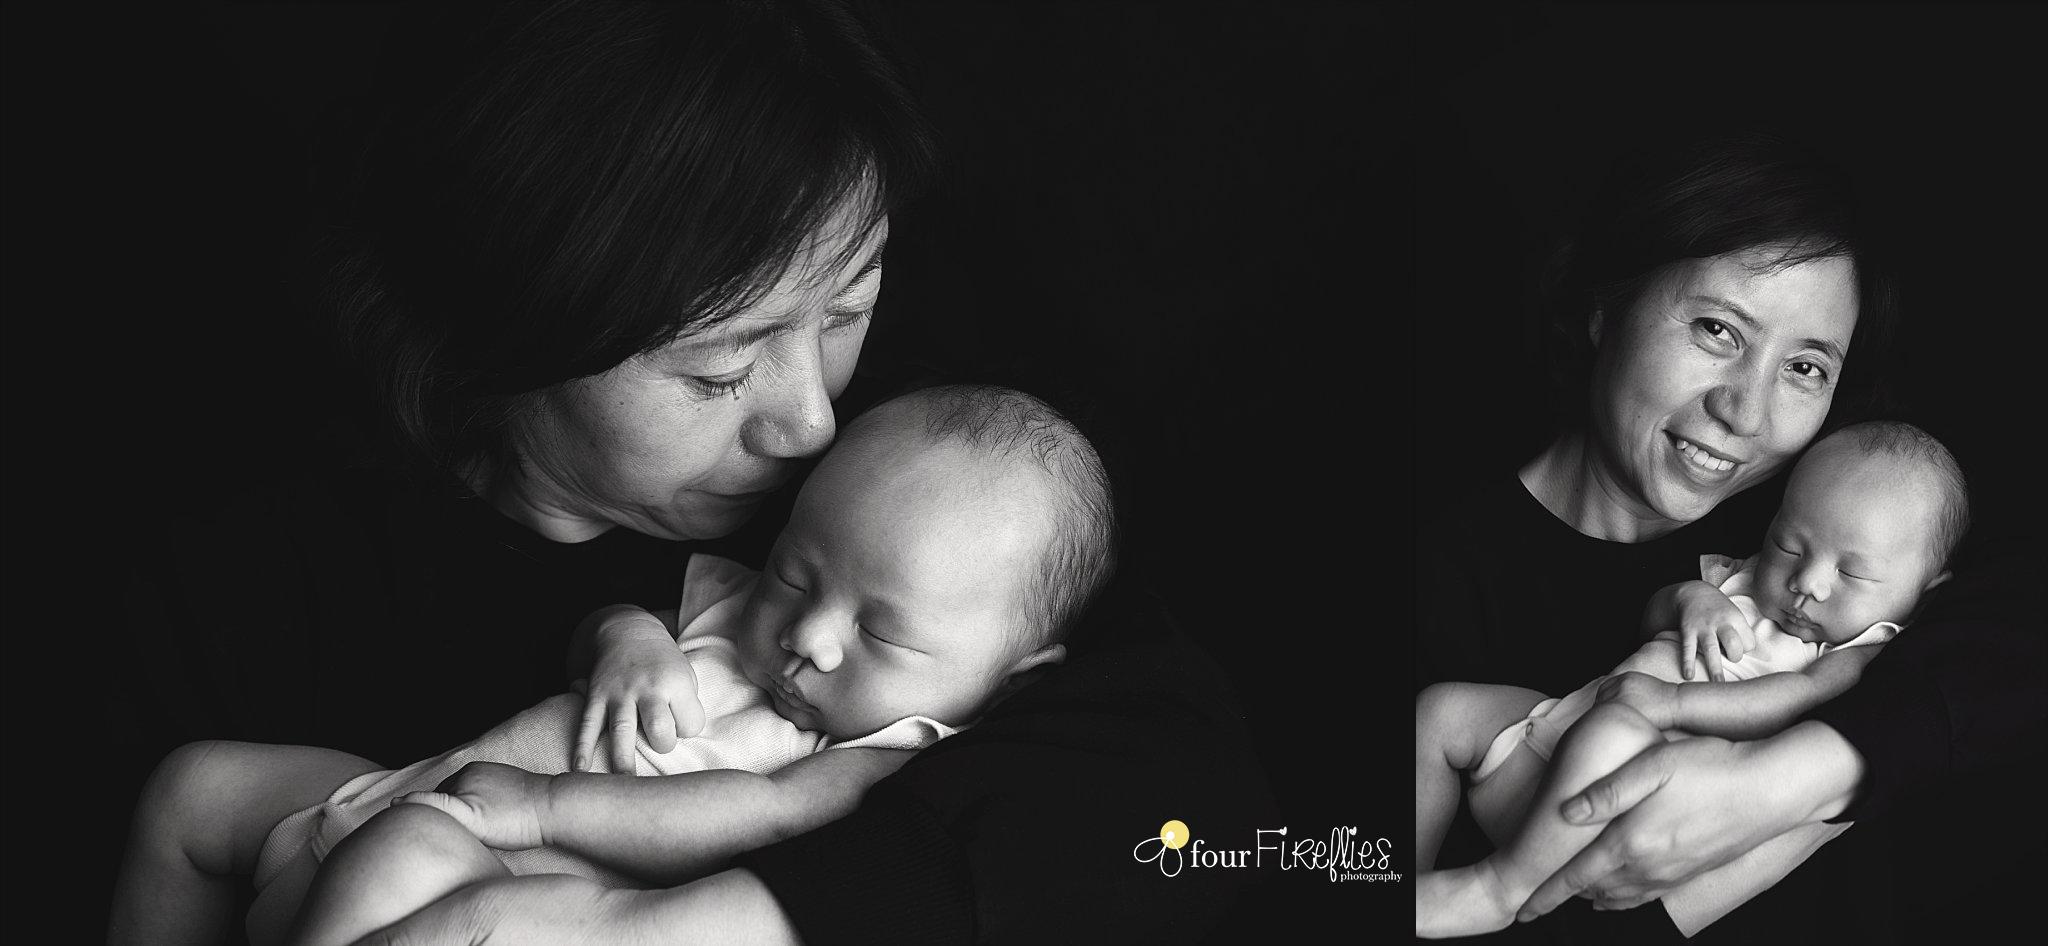 st-louis-newborn-photographer-baby-in-onsie-with-grandma-in-black-and-white.jpg